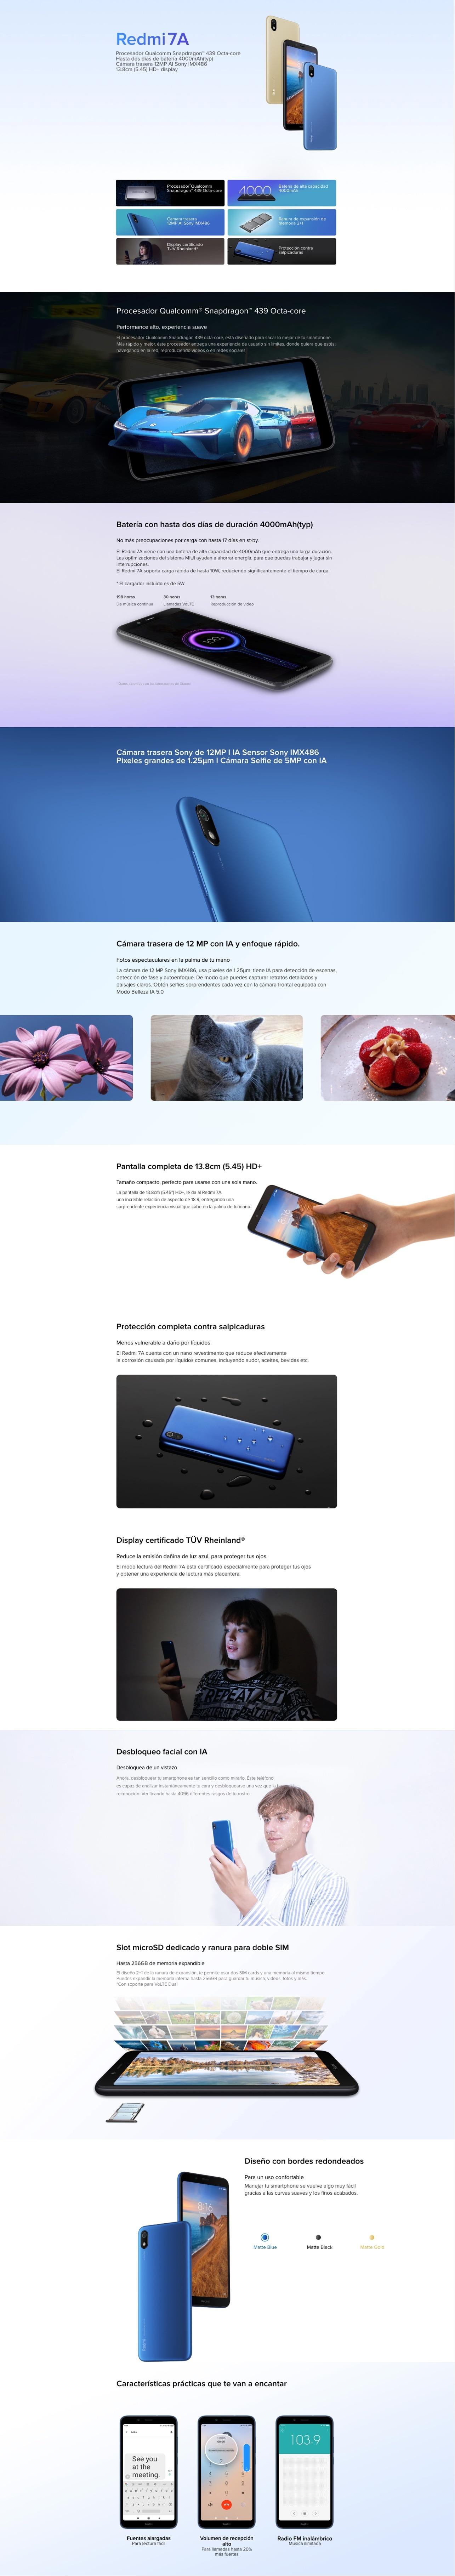 Xiaomi_Redmi_7A - www_mistore_mx_full_desc